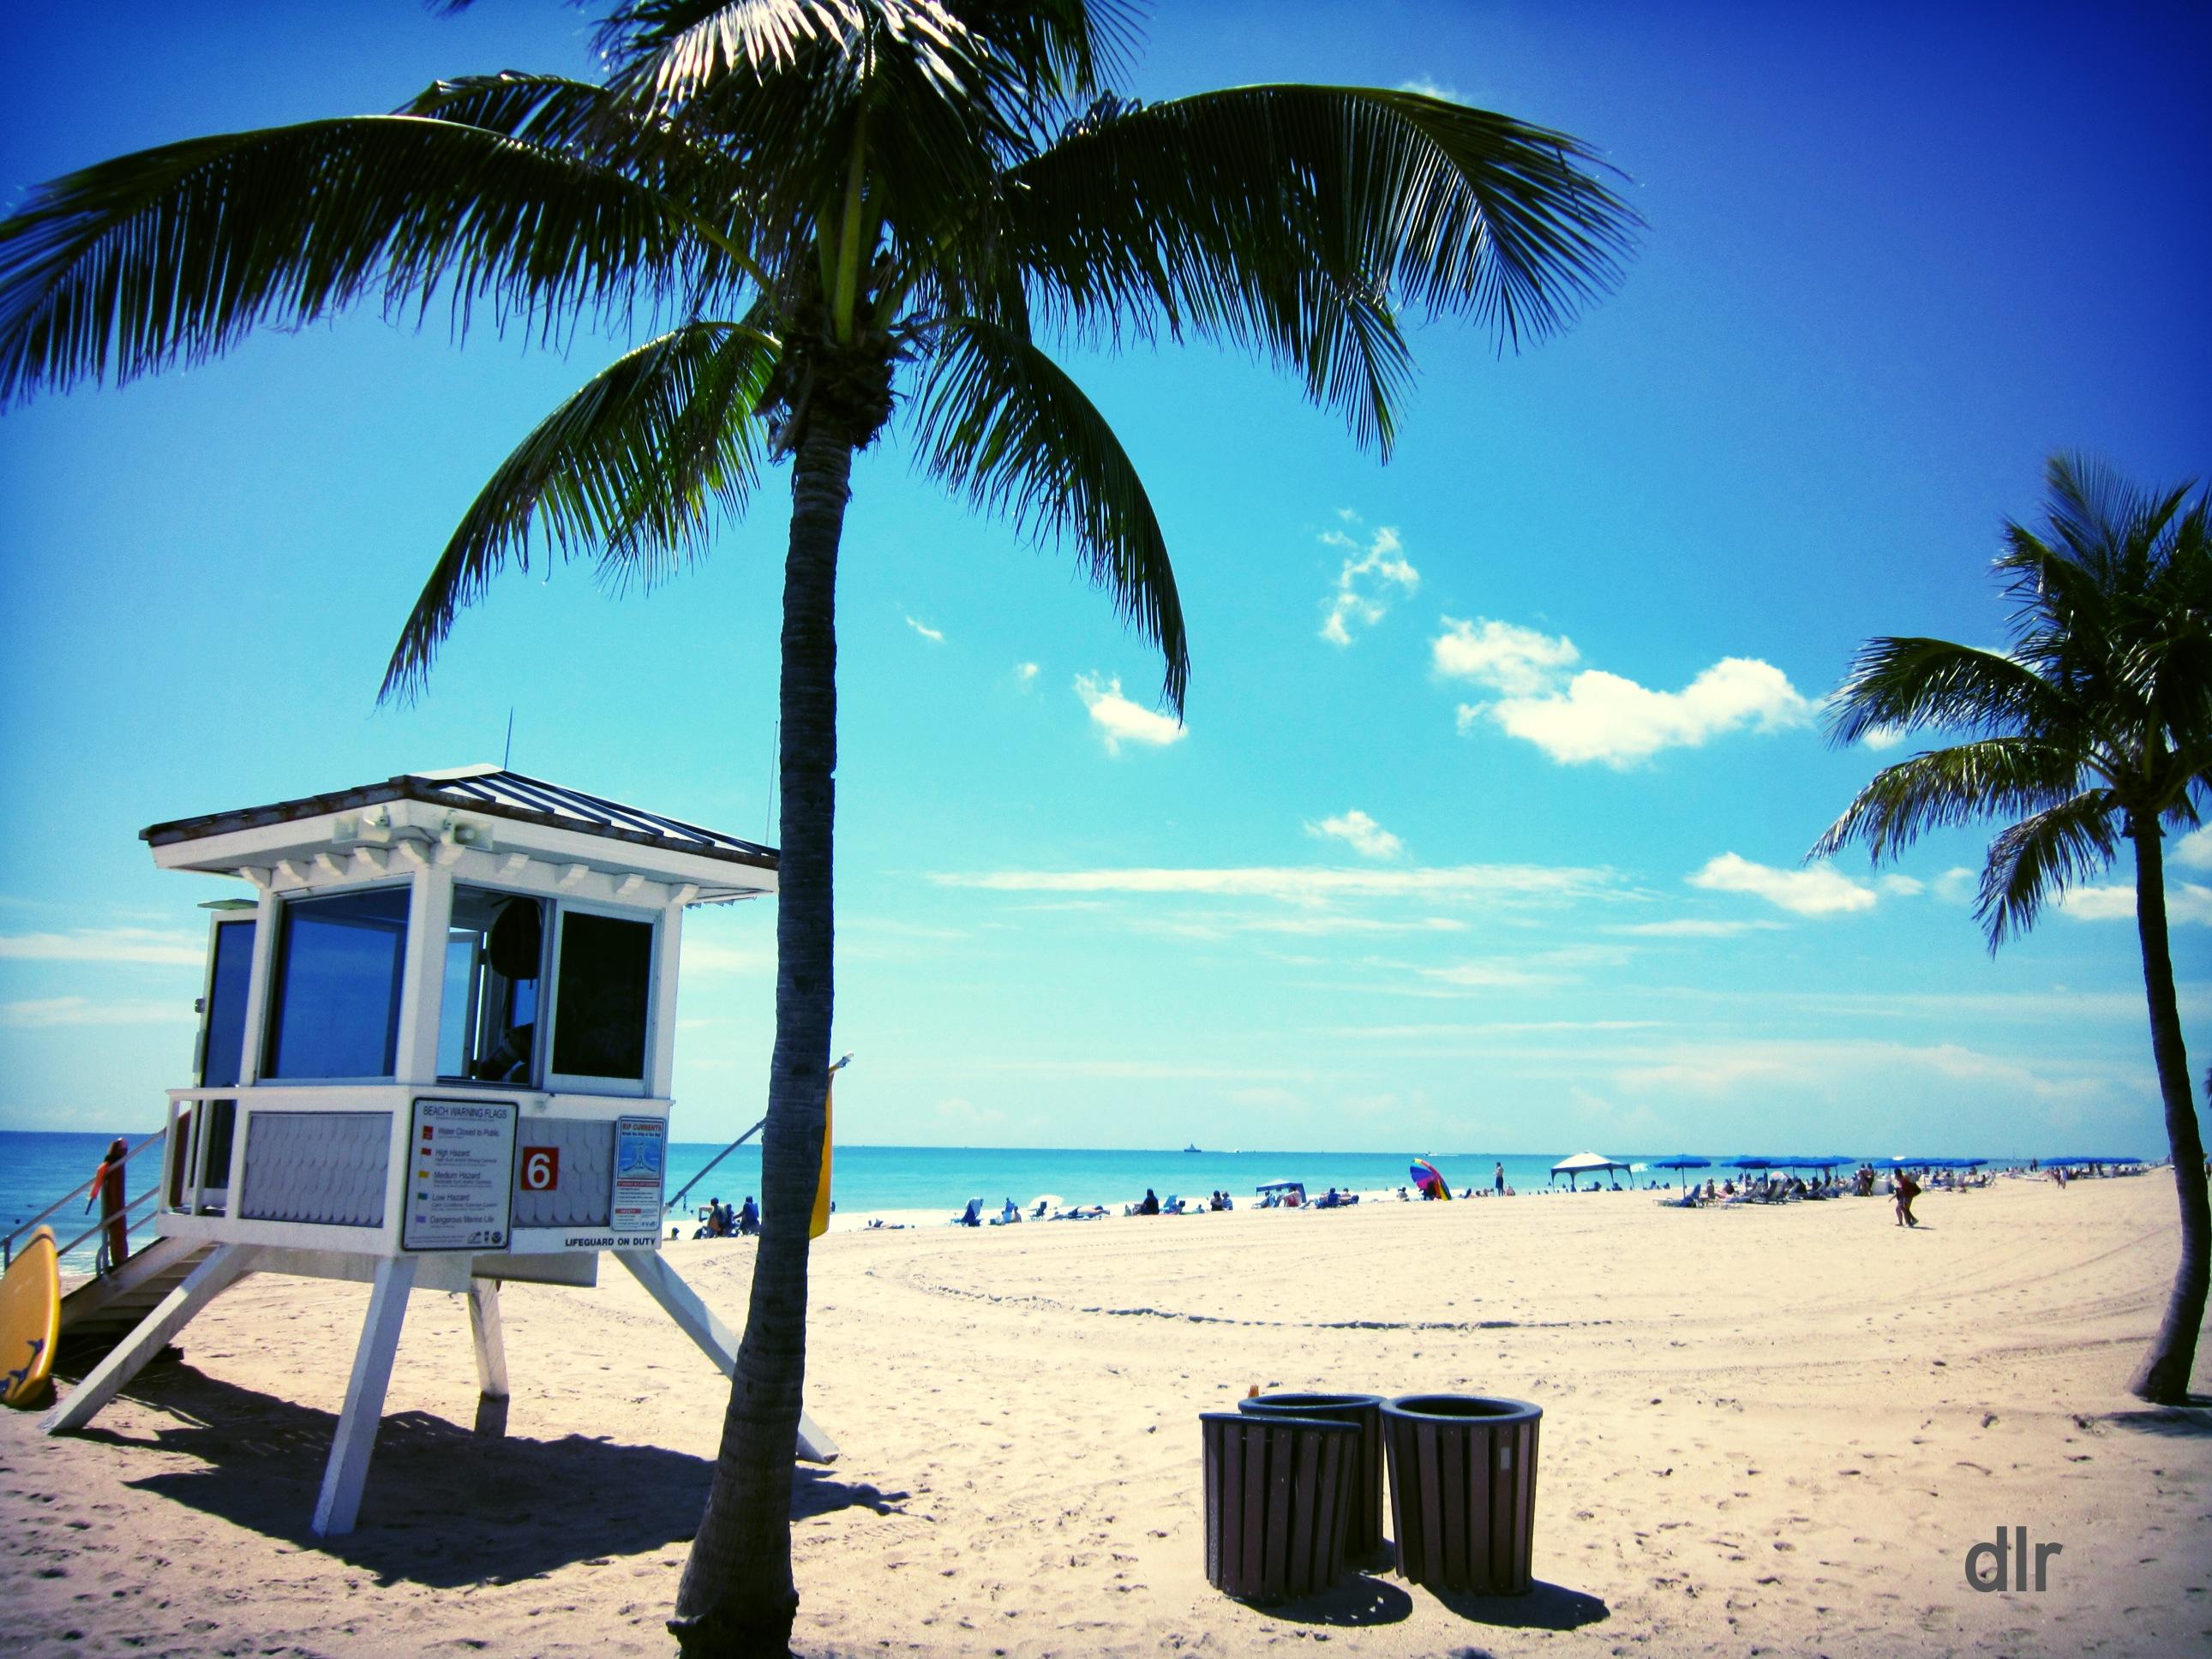 Ft Lauderdale Beach Resort Breakers Ave